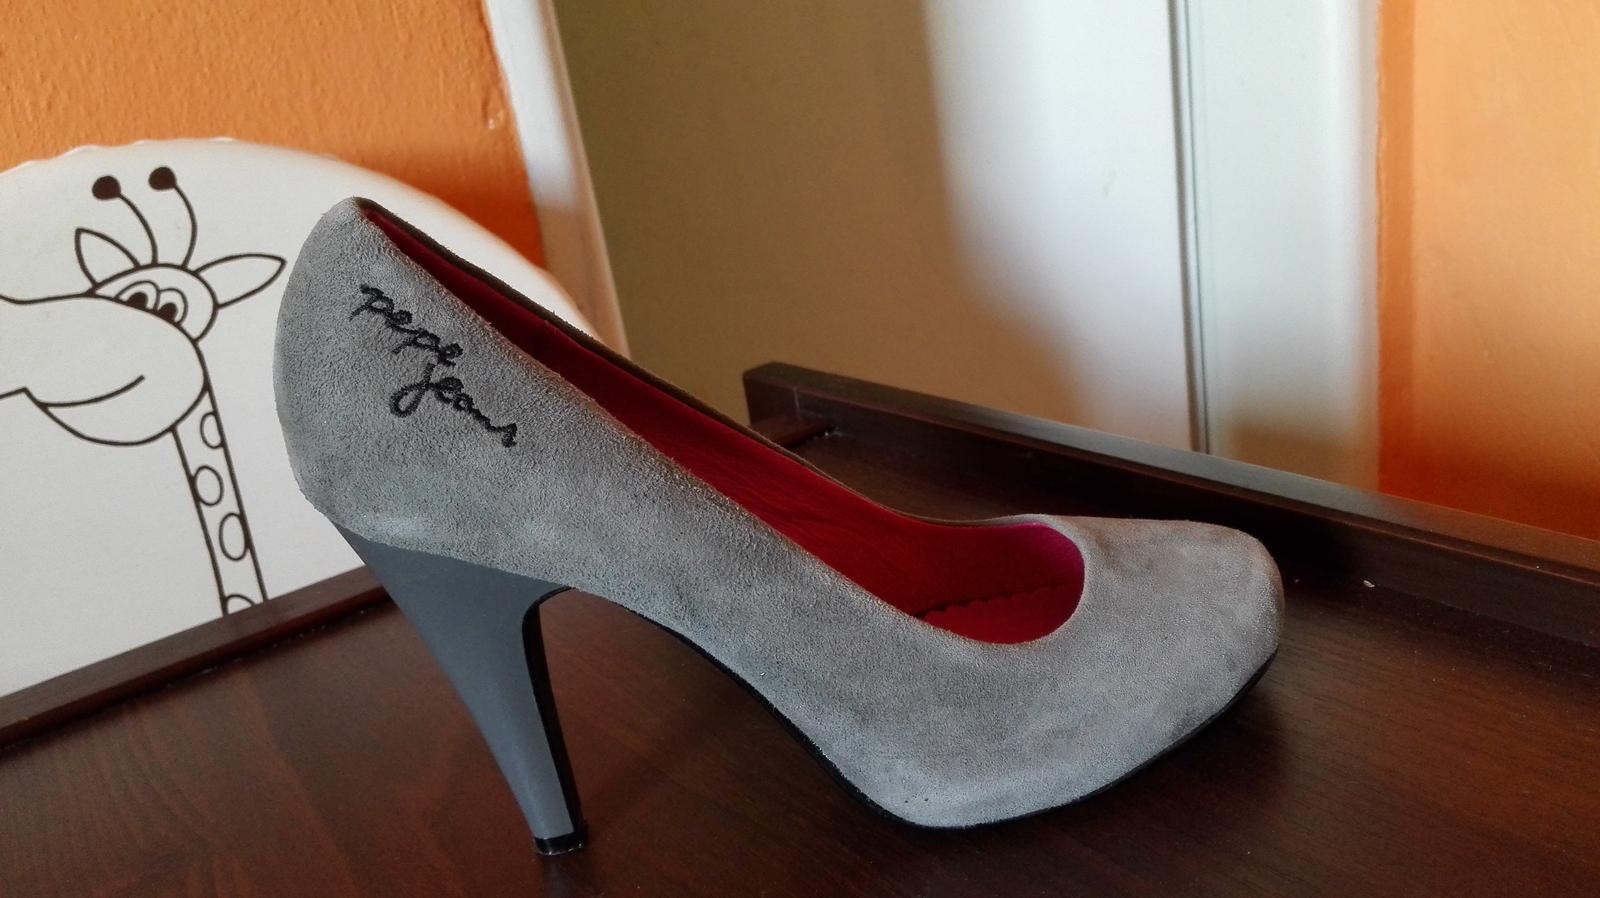 469023e5c395f Dámske topánky na vysokom opätku - pepe jeans, 37 - 25 € | Svadobný ...